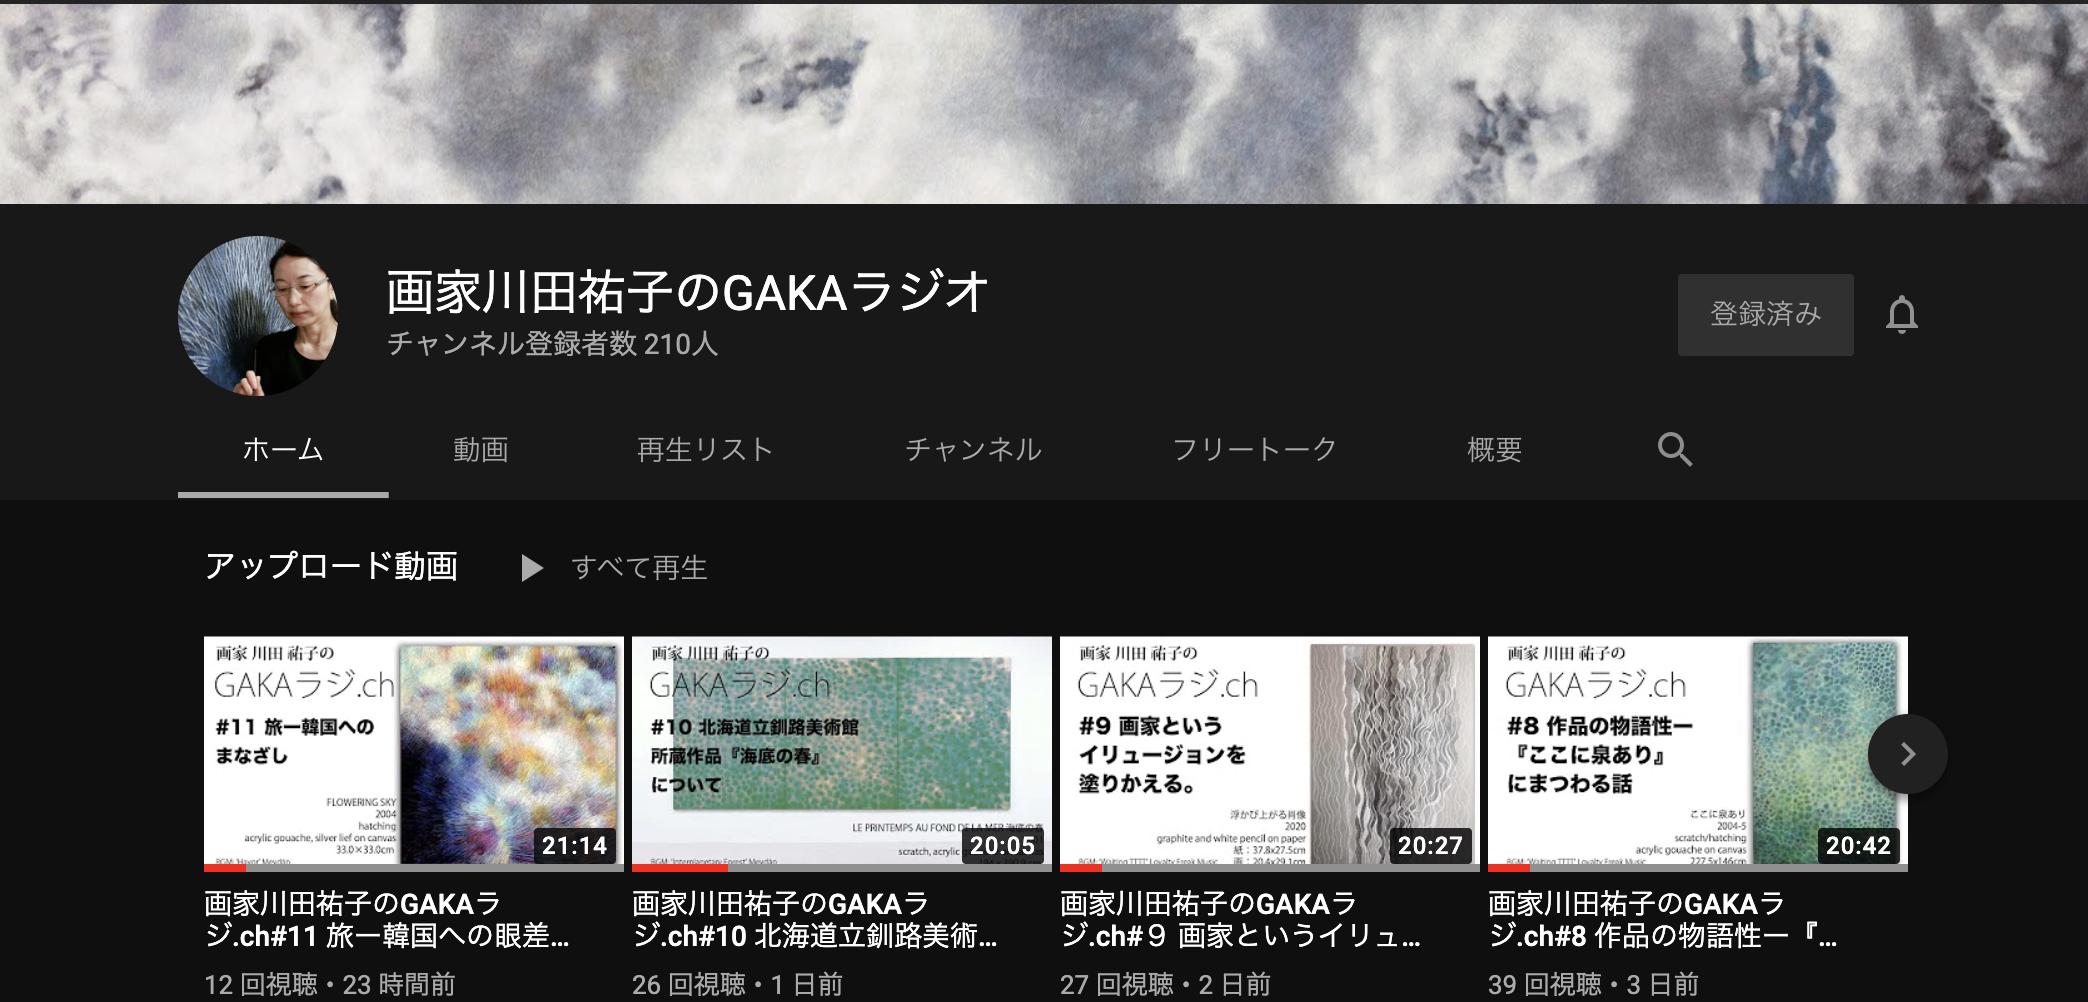 You Tube 「画家川田祐子のGAKAラジオ」毎日配信中